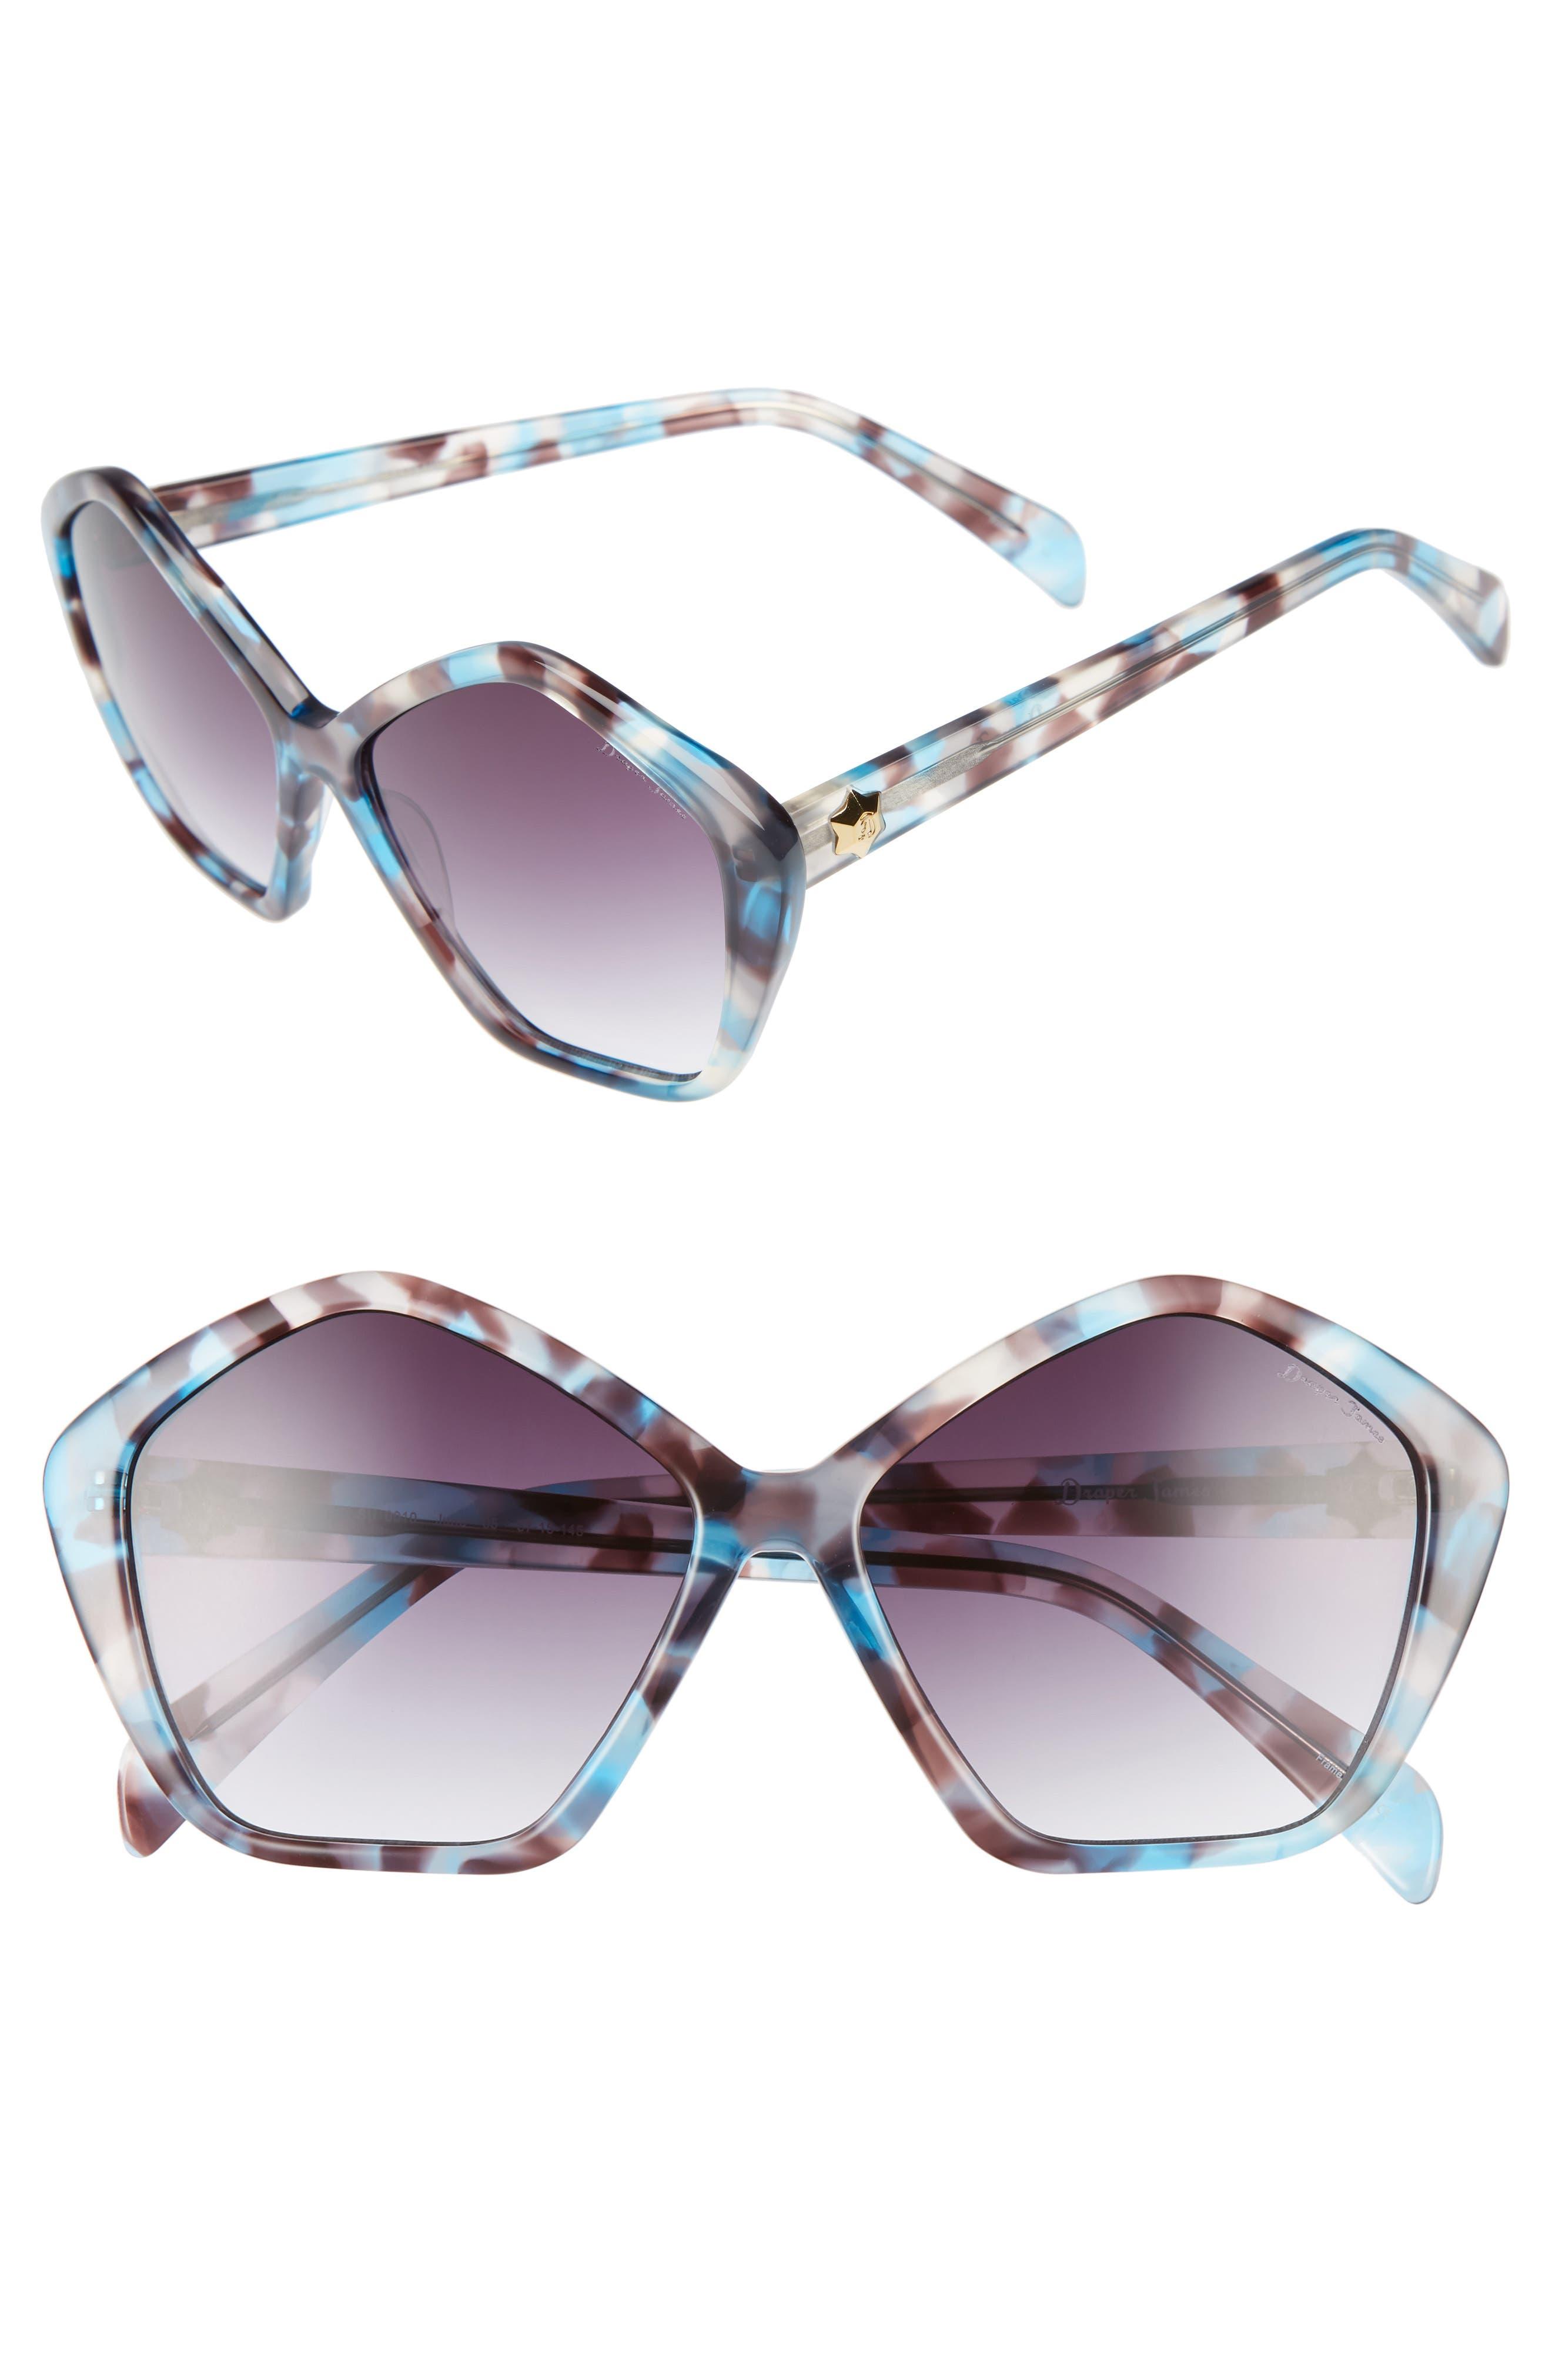 DRAPER JAMES 57mm Gradient Lens Geometric Sunglasses